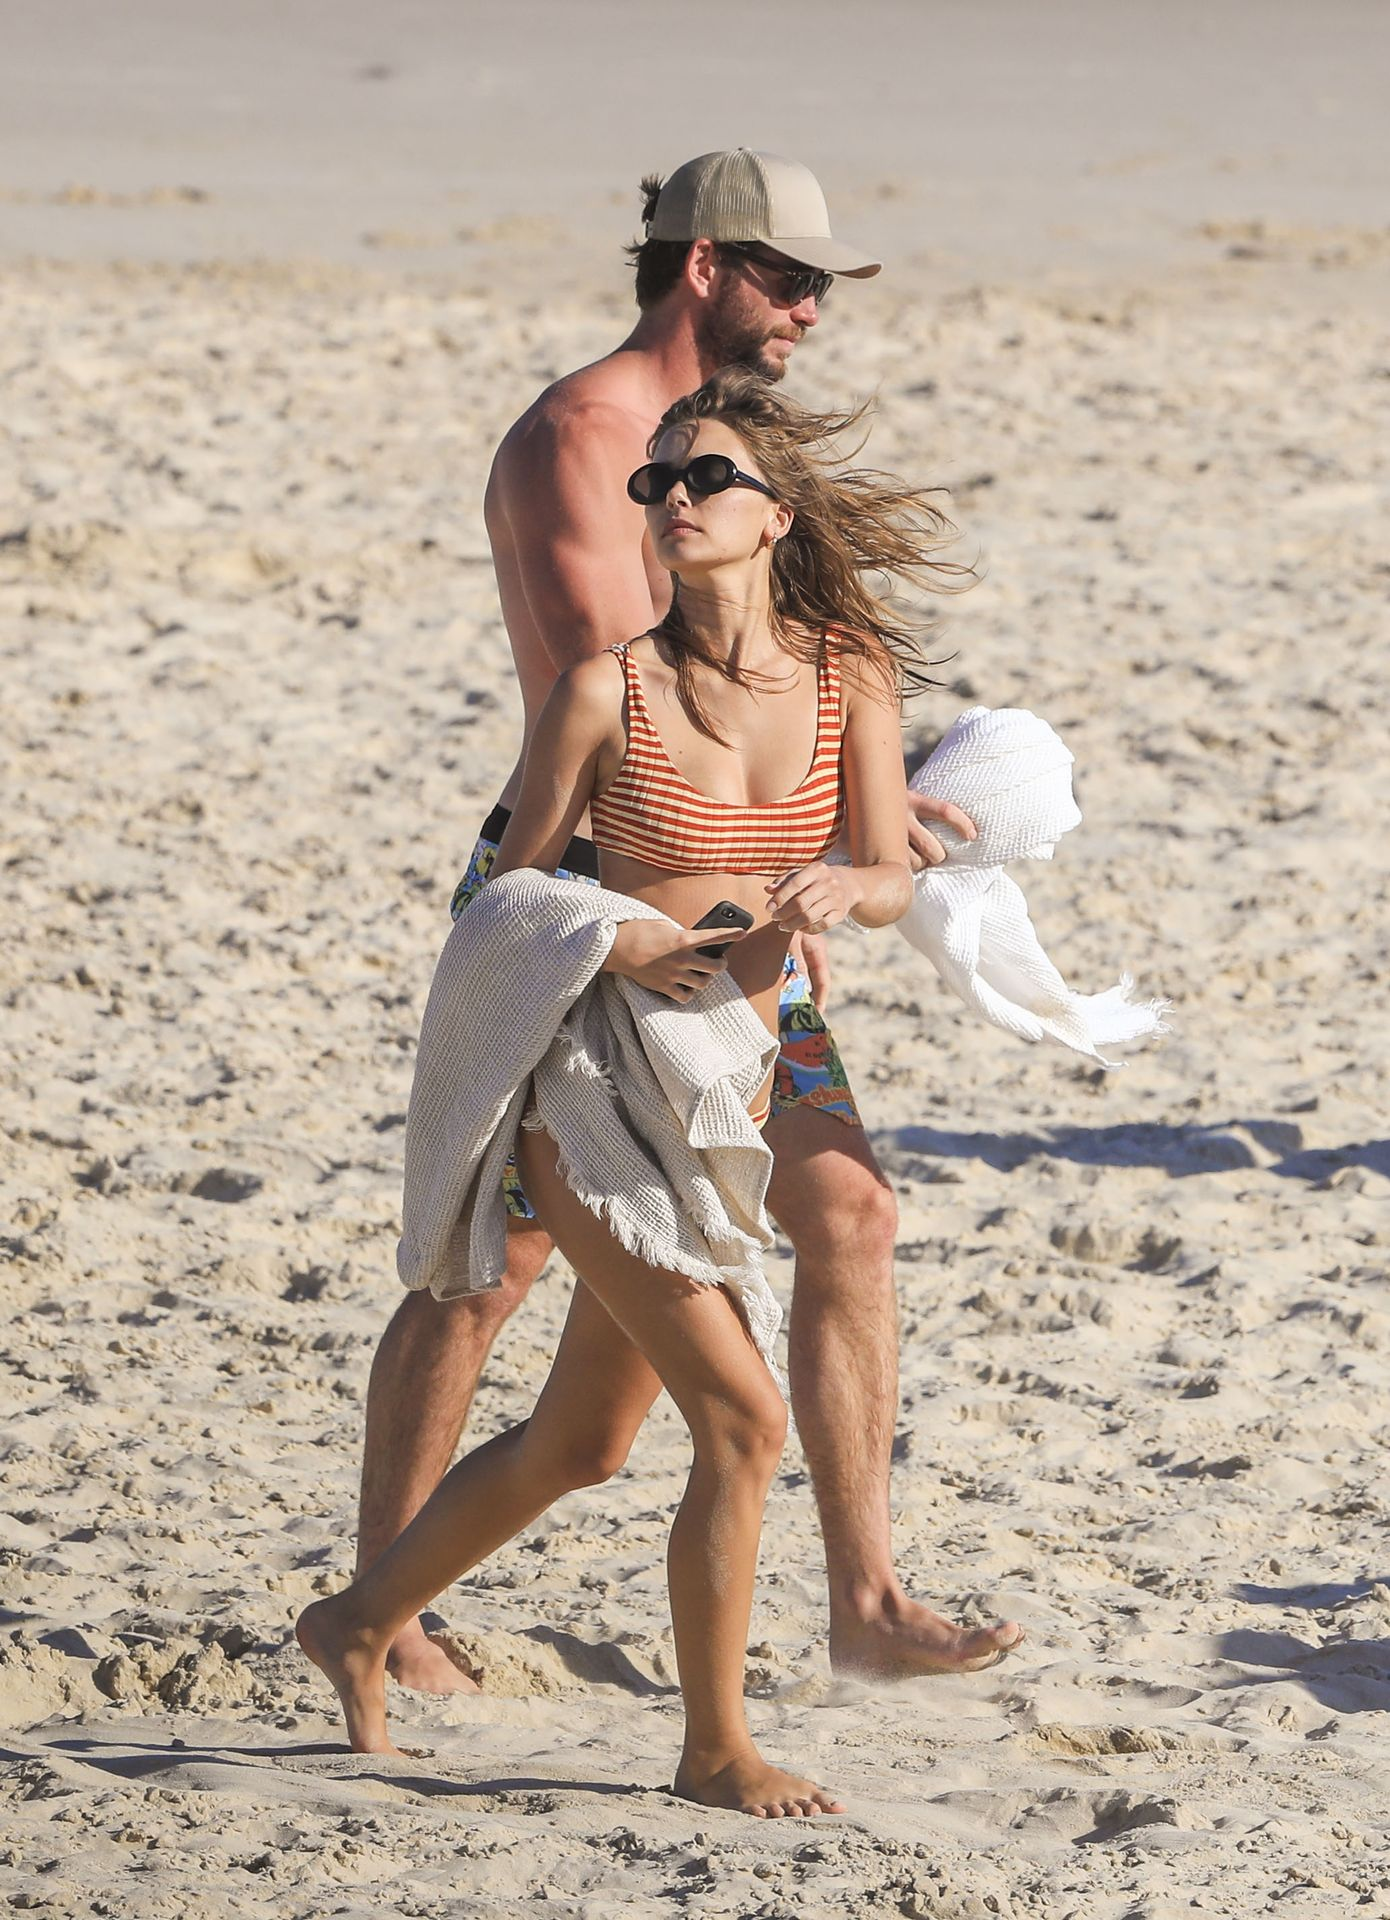 Gabriella Brooks Hot – Liam Hemsworth's New Girlfriend 0061